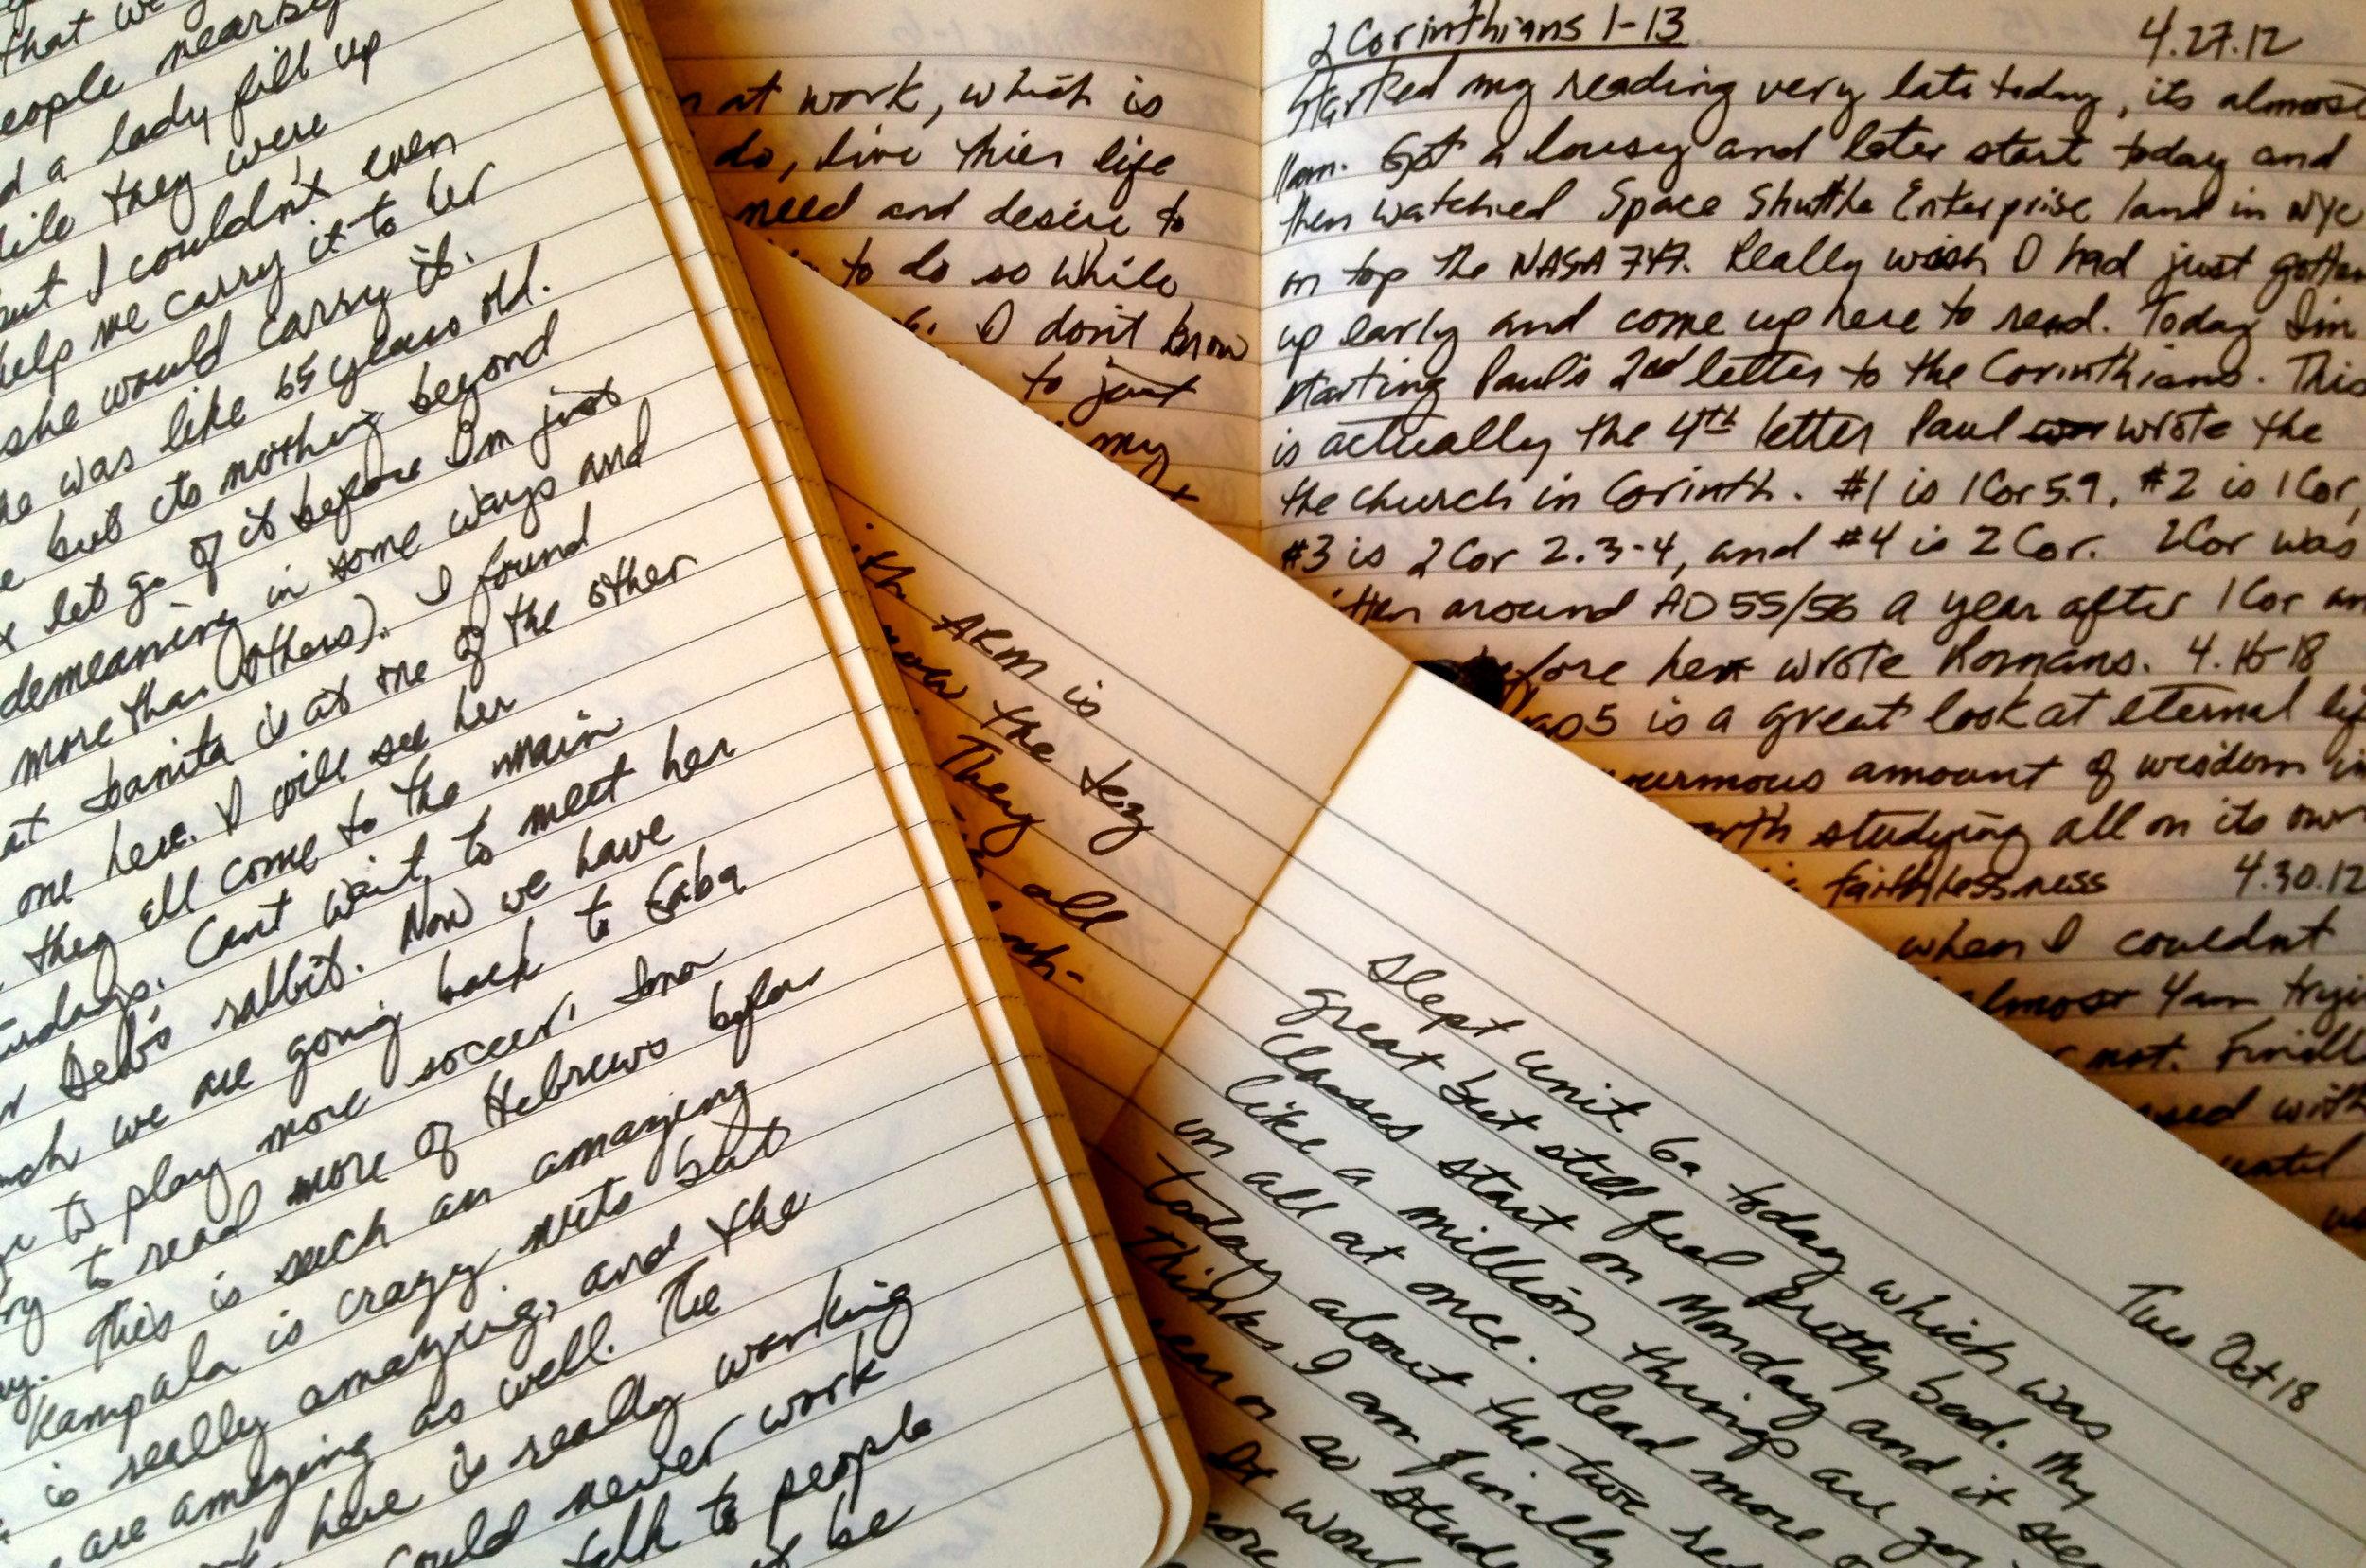 Writing Sample of Moleskine Journals